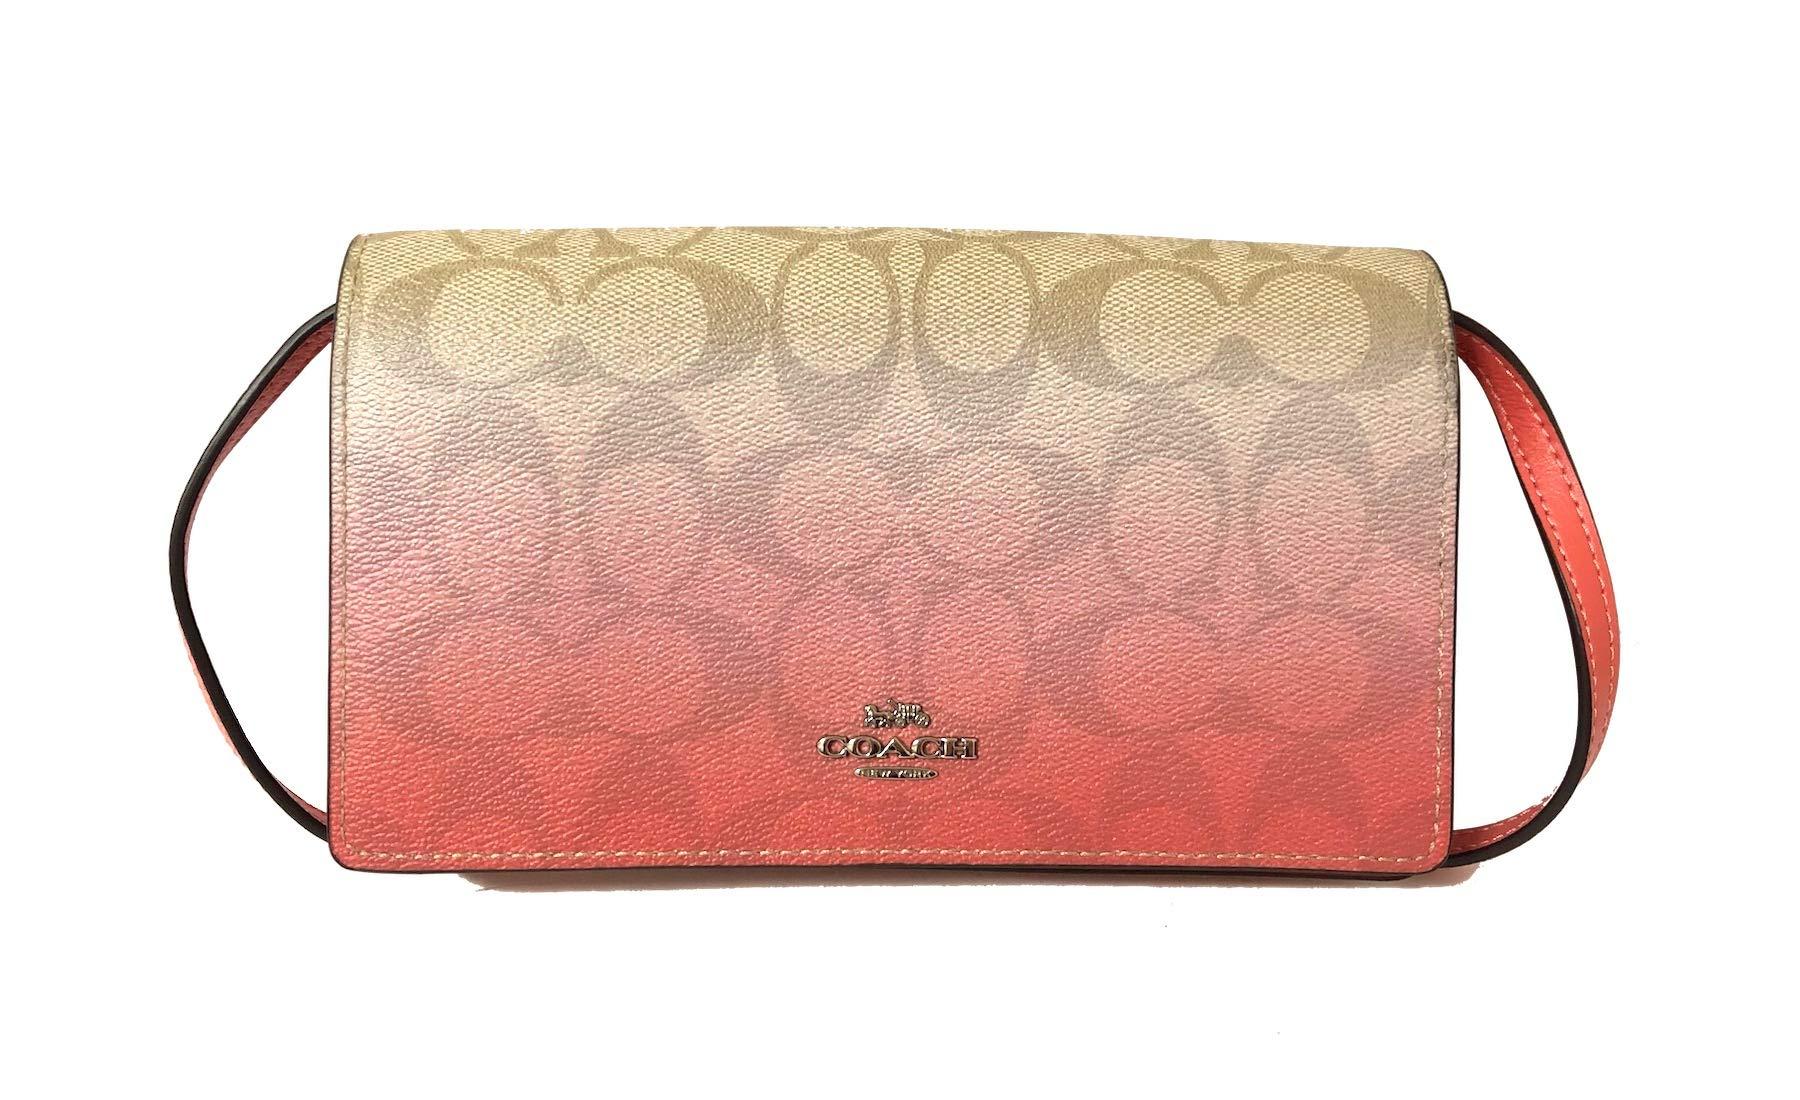 Coach Foldover Clutch Wallet Pebbled Leather Crossbody Bag F30256 (SV/Light Khaki/Pink Multi)